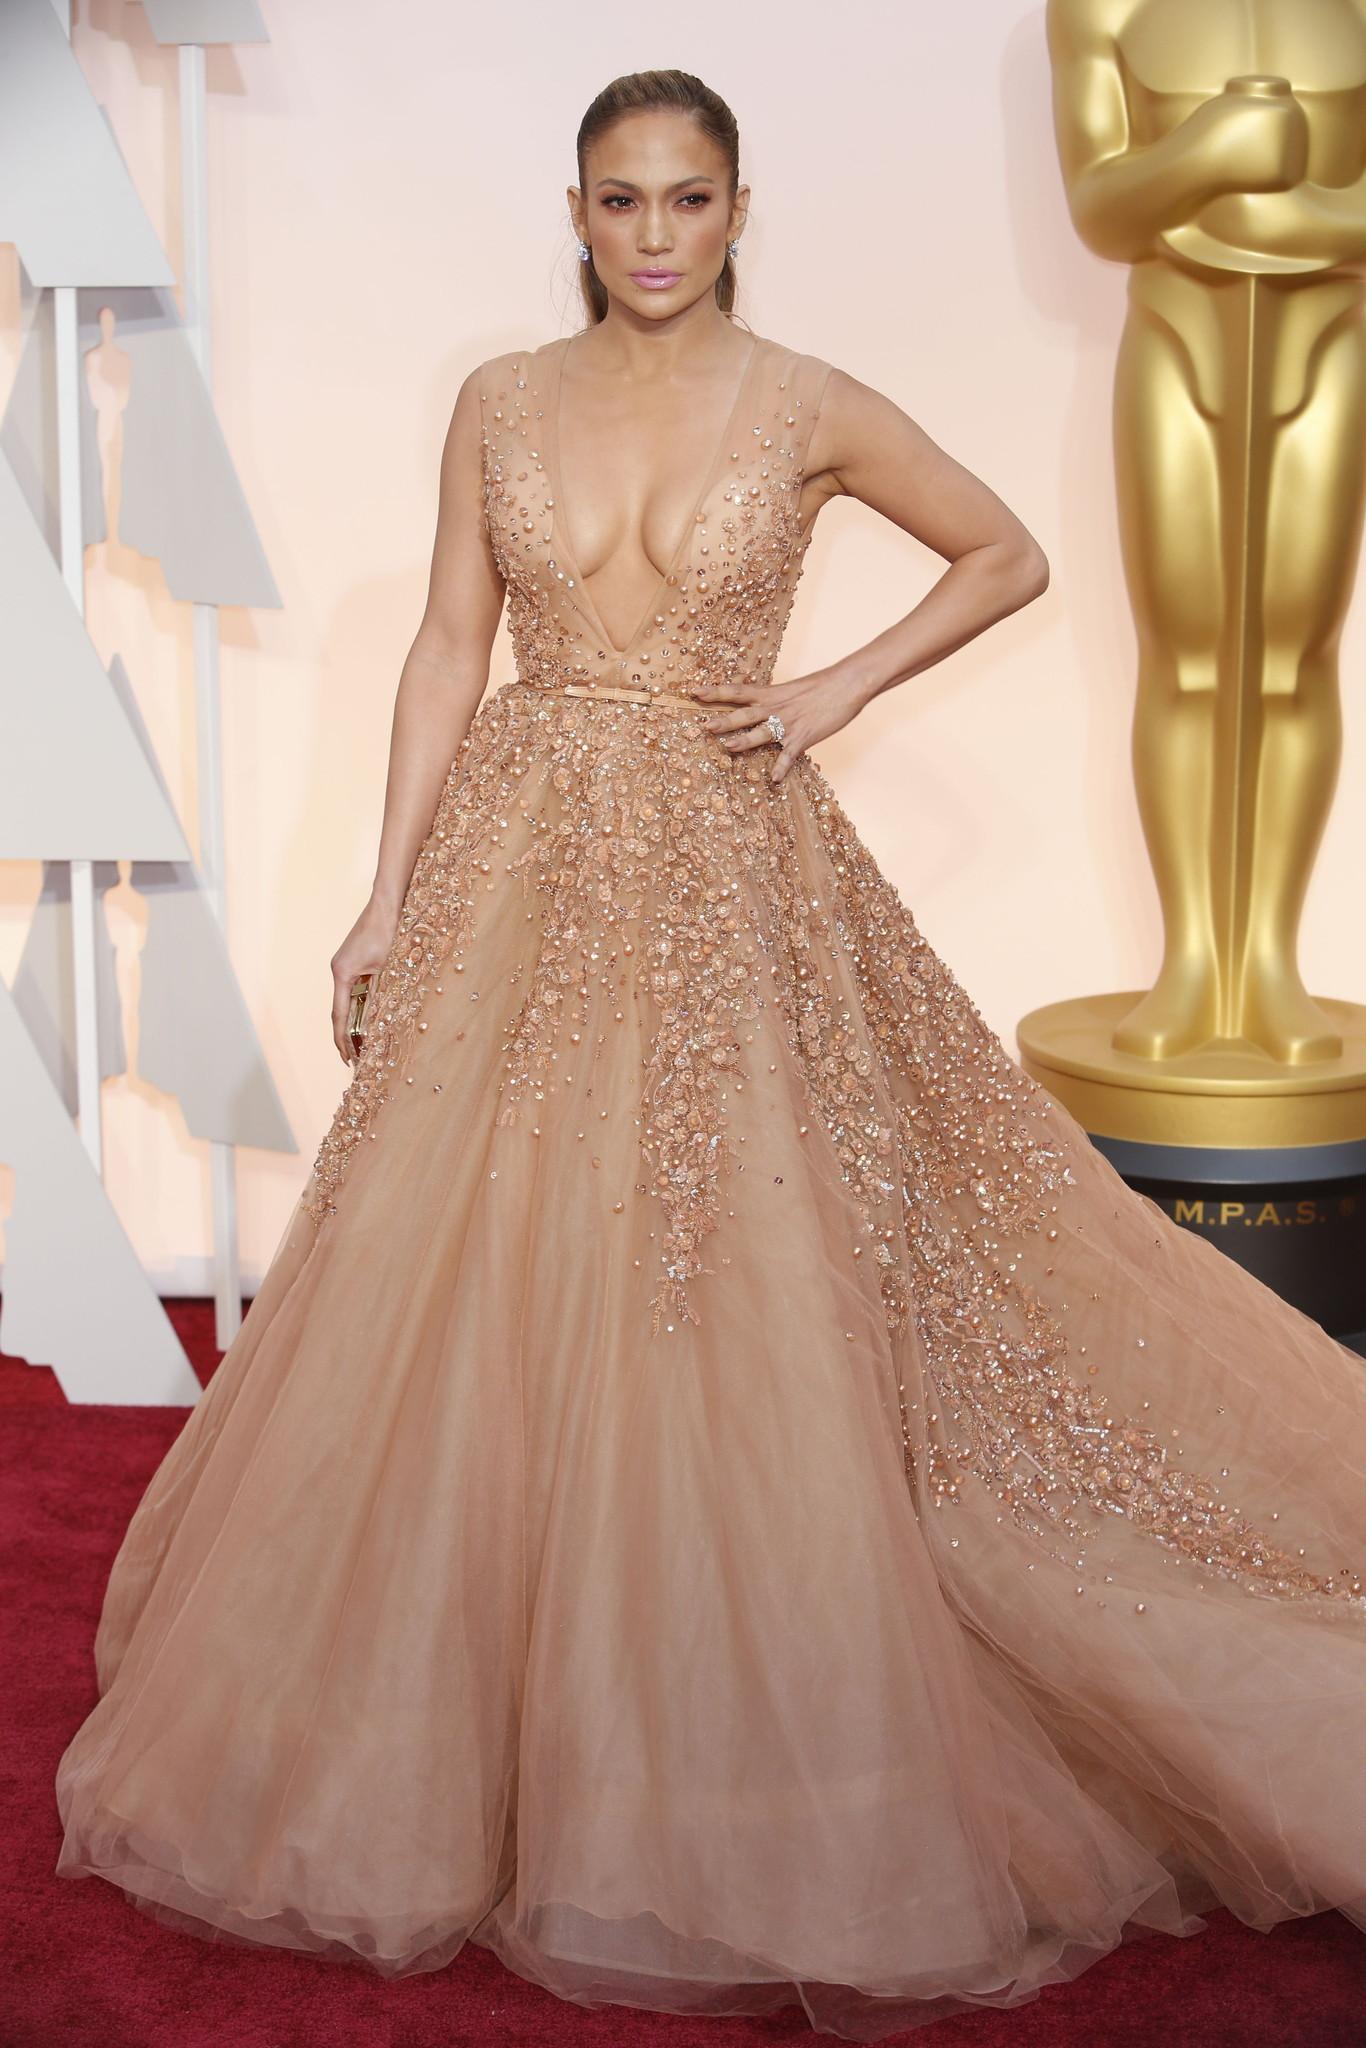 Giuliana rancic 2014 oscars paolo sebastian dress - Jennifer Lopez Wearing Elie Saab Haute Couture At The 2015 Oscars